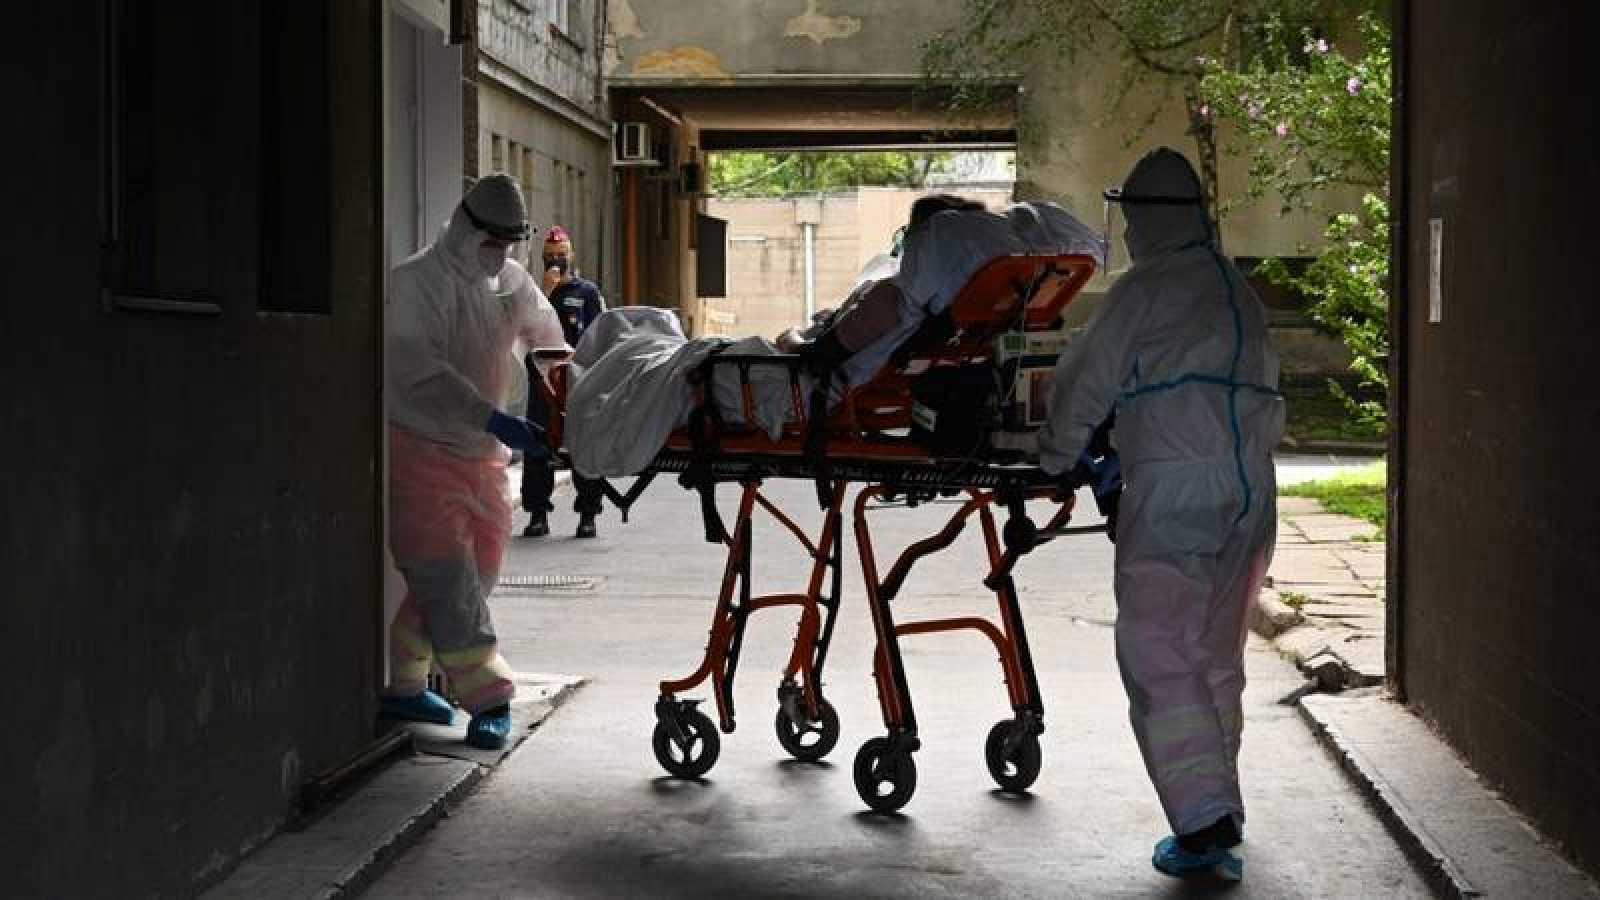 Simulacro de emergencia sanitaria en el hospital Kutvolgyi de Budapest